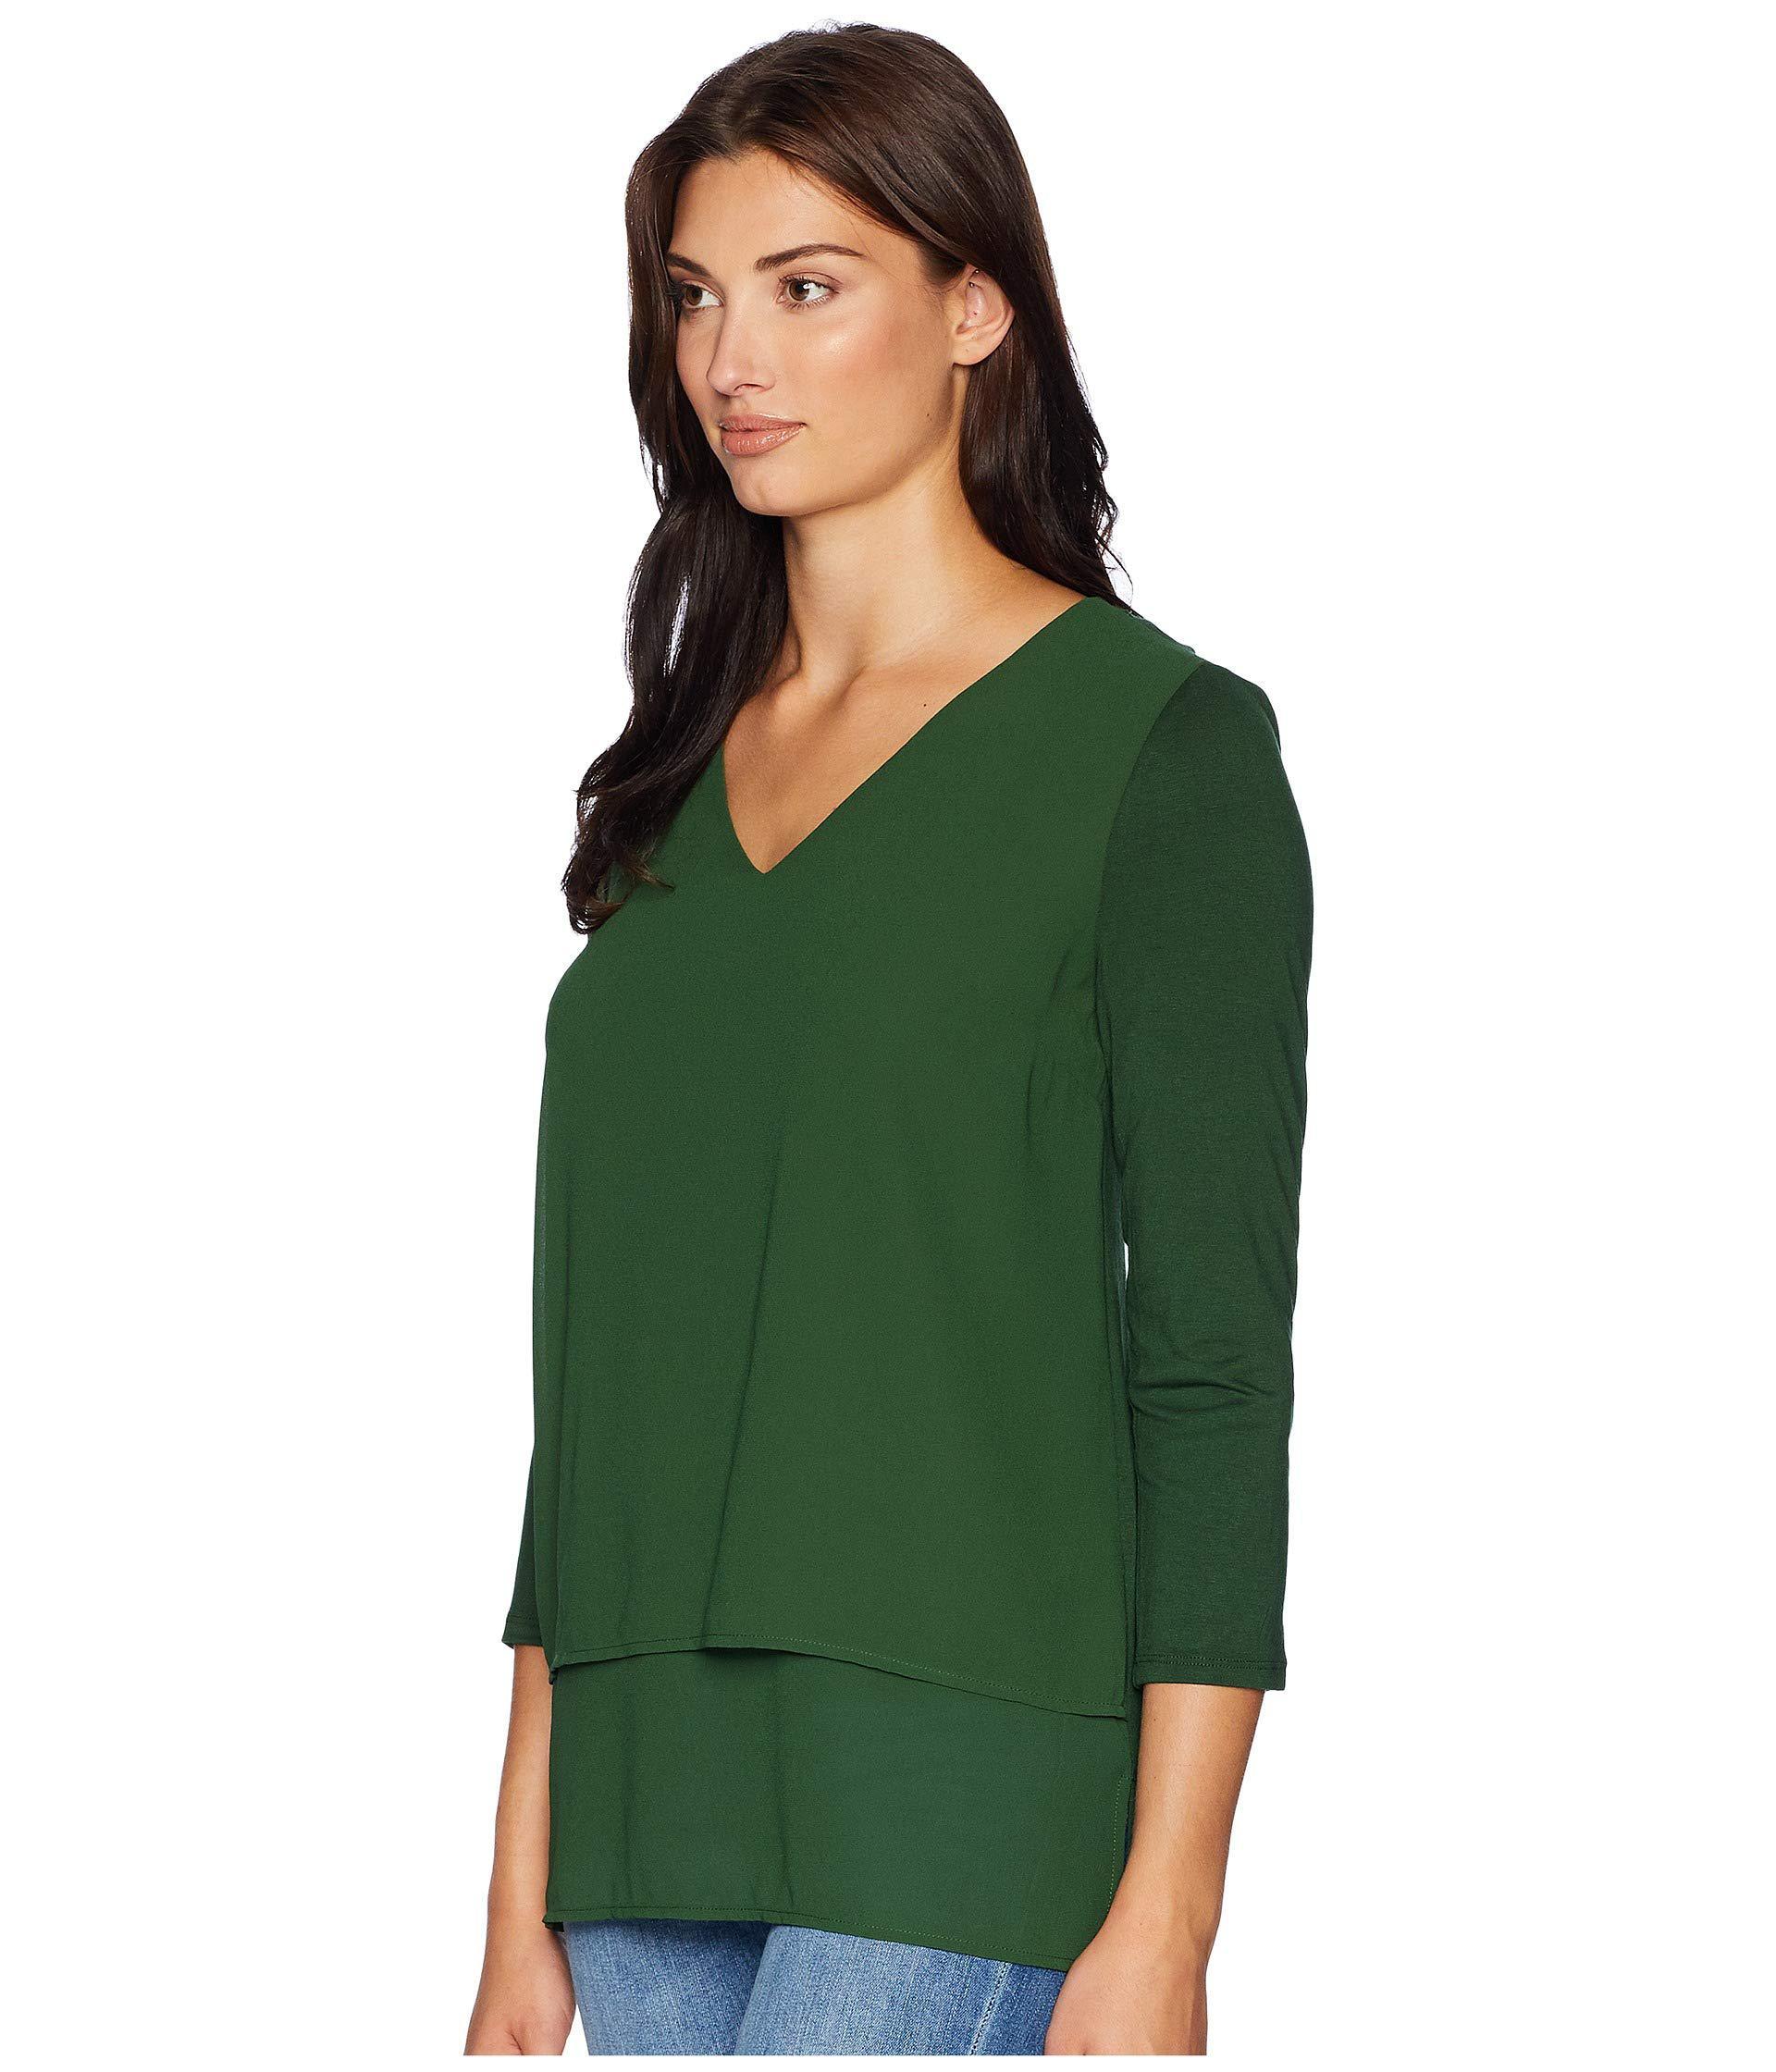 1d1ef49b4a6 Lyst - MICHAEL Michael Kors V-neck Mixed Media (moss) Women's Clothing in  Green